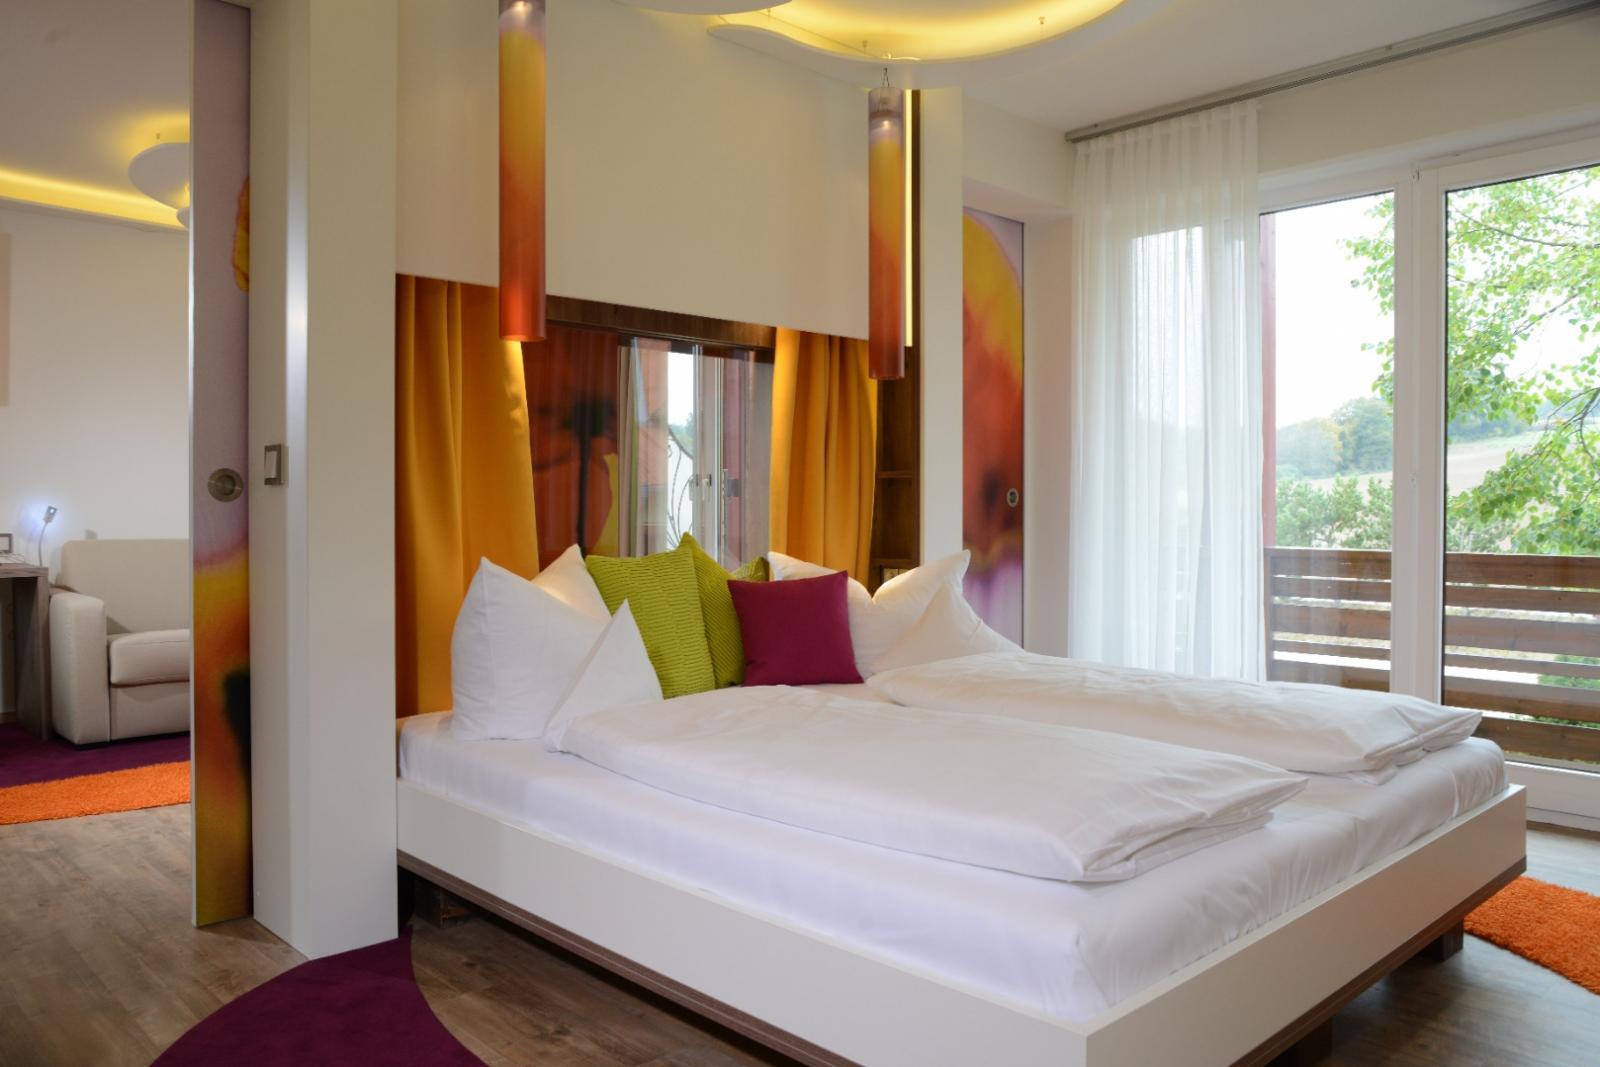 Hotel Freund Oberorke Bewertung